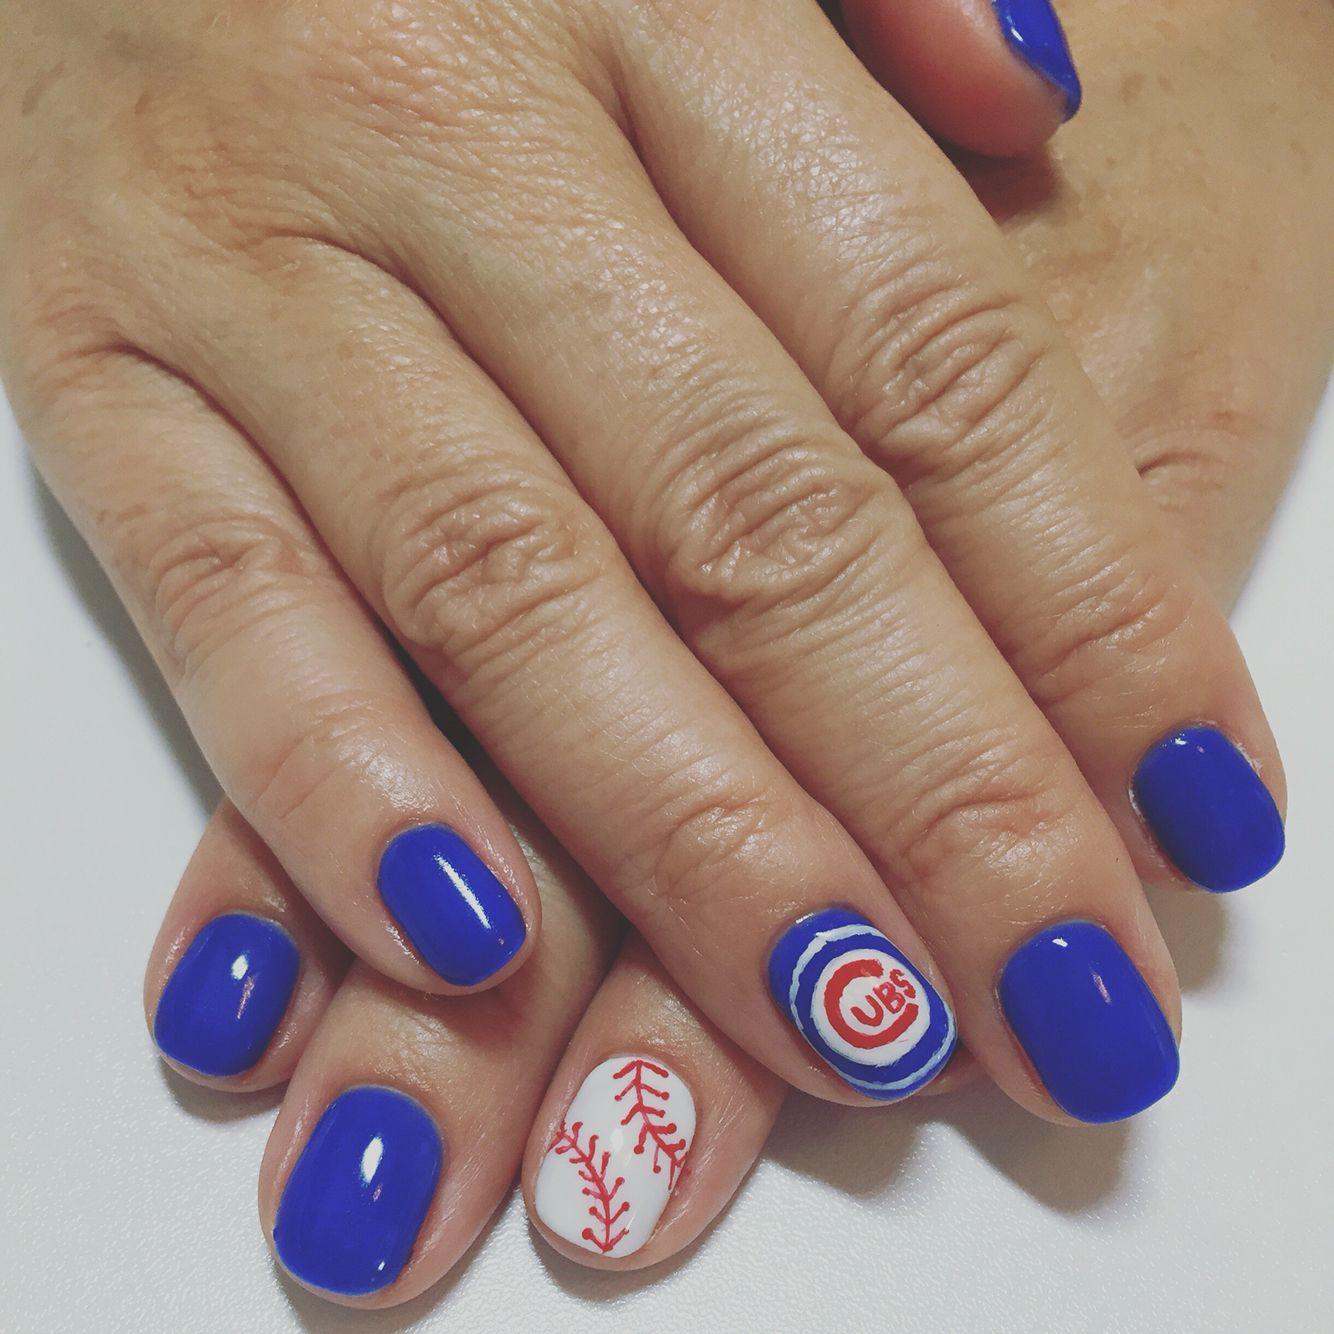 Chicago Cubs nails 6/15/16 by Tomoka Kanazawa | reg | Pinterest ...